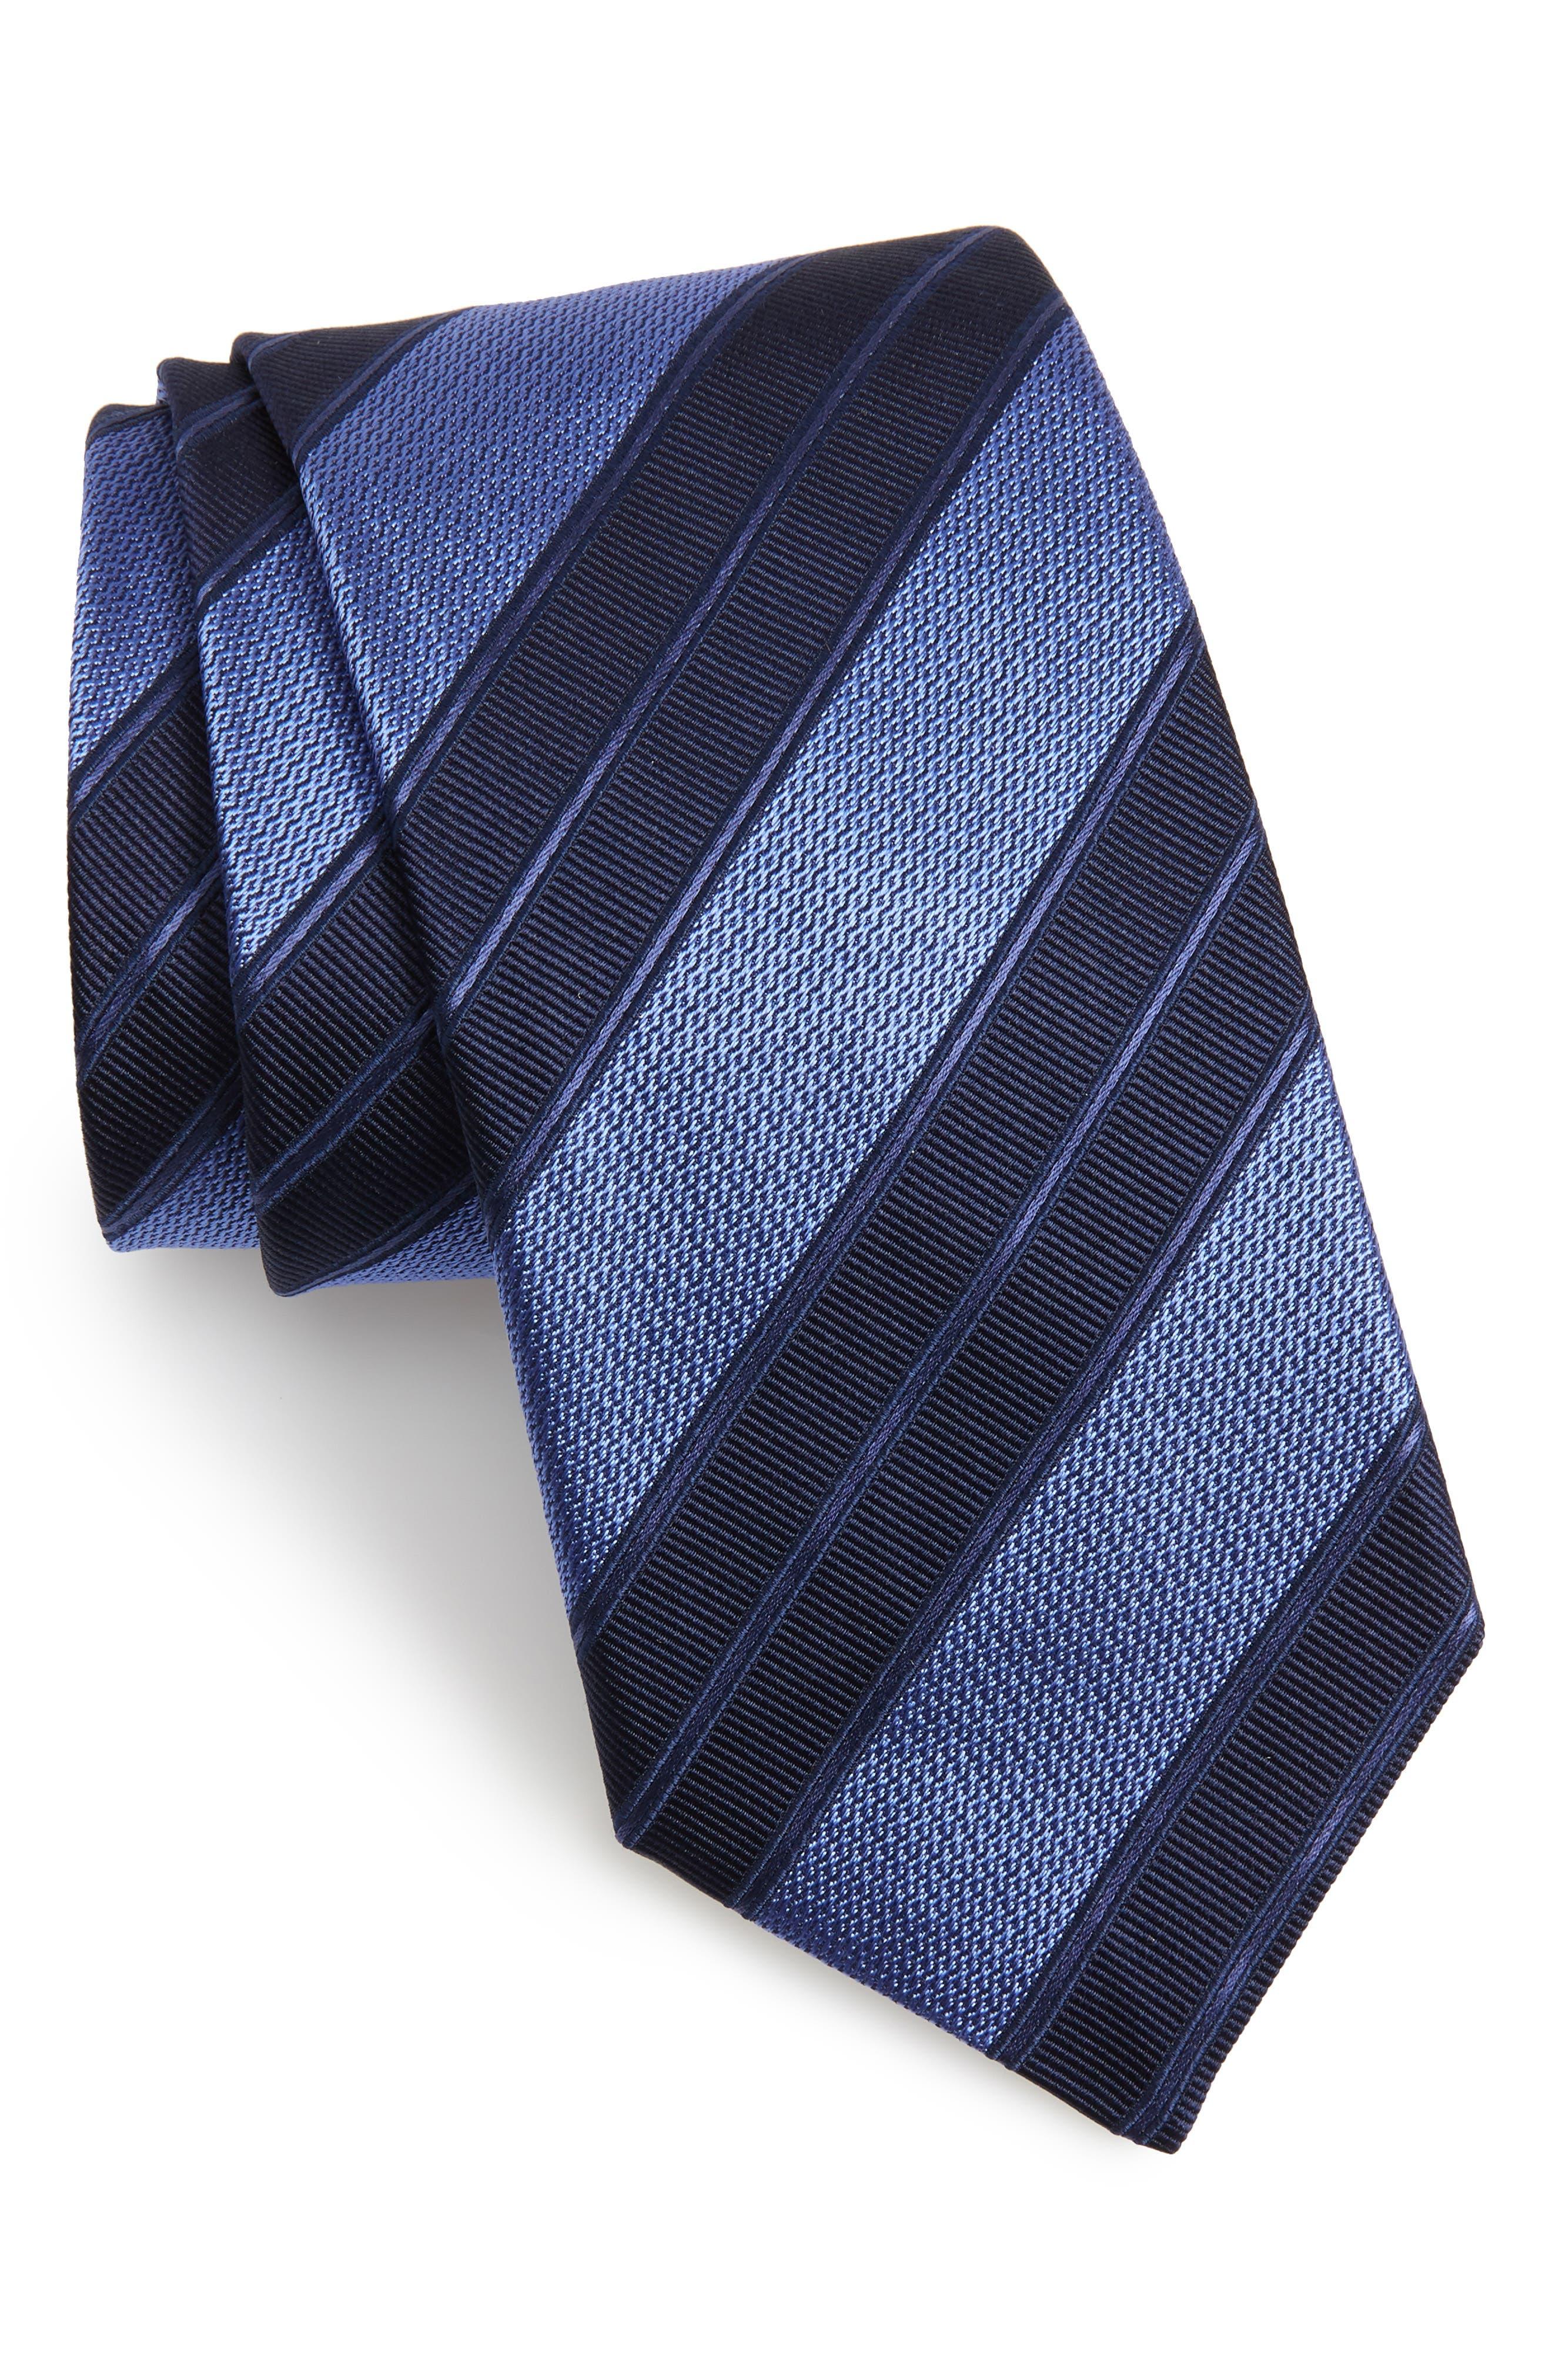 Stripe Silk Tie,                             Main thumbnail 1, color,                             Navy